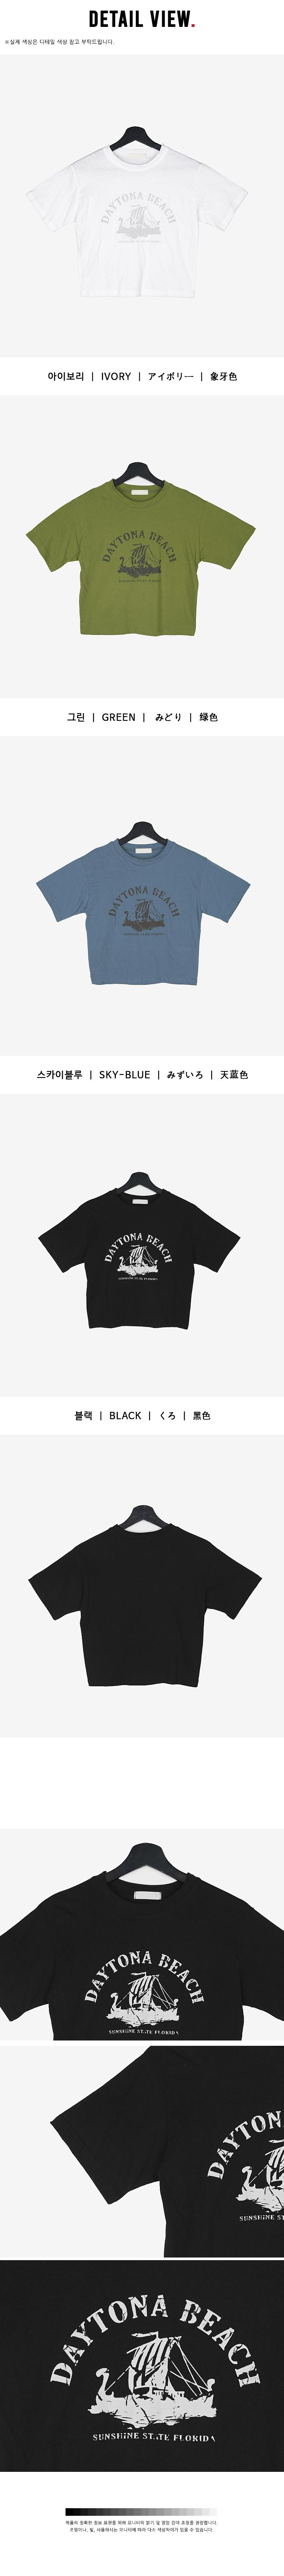 Sheep print cropped short-sleeved T-shirt